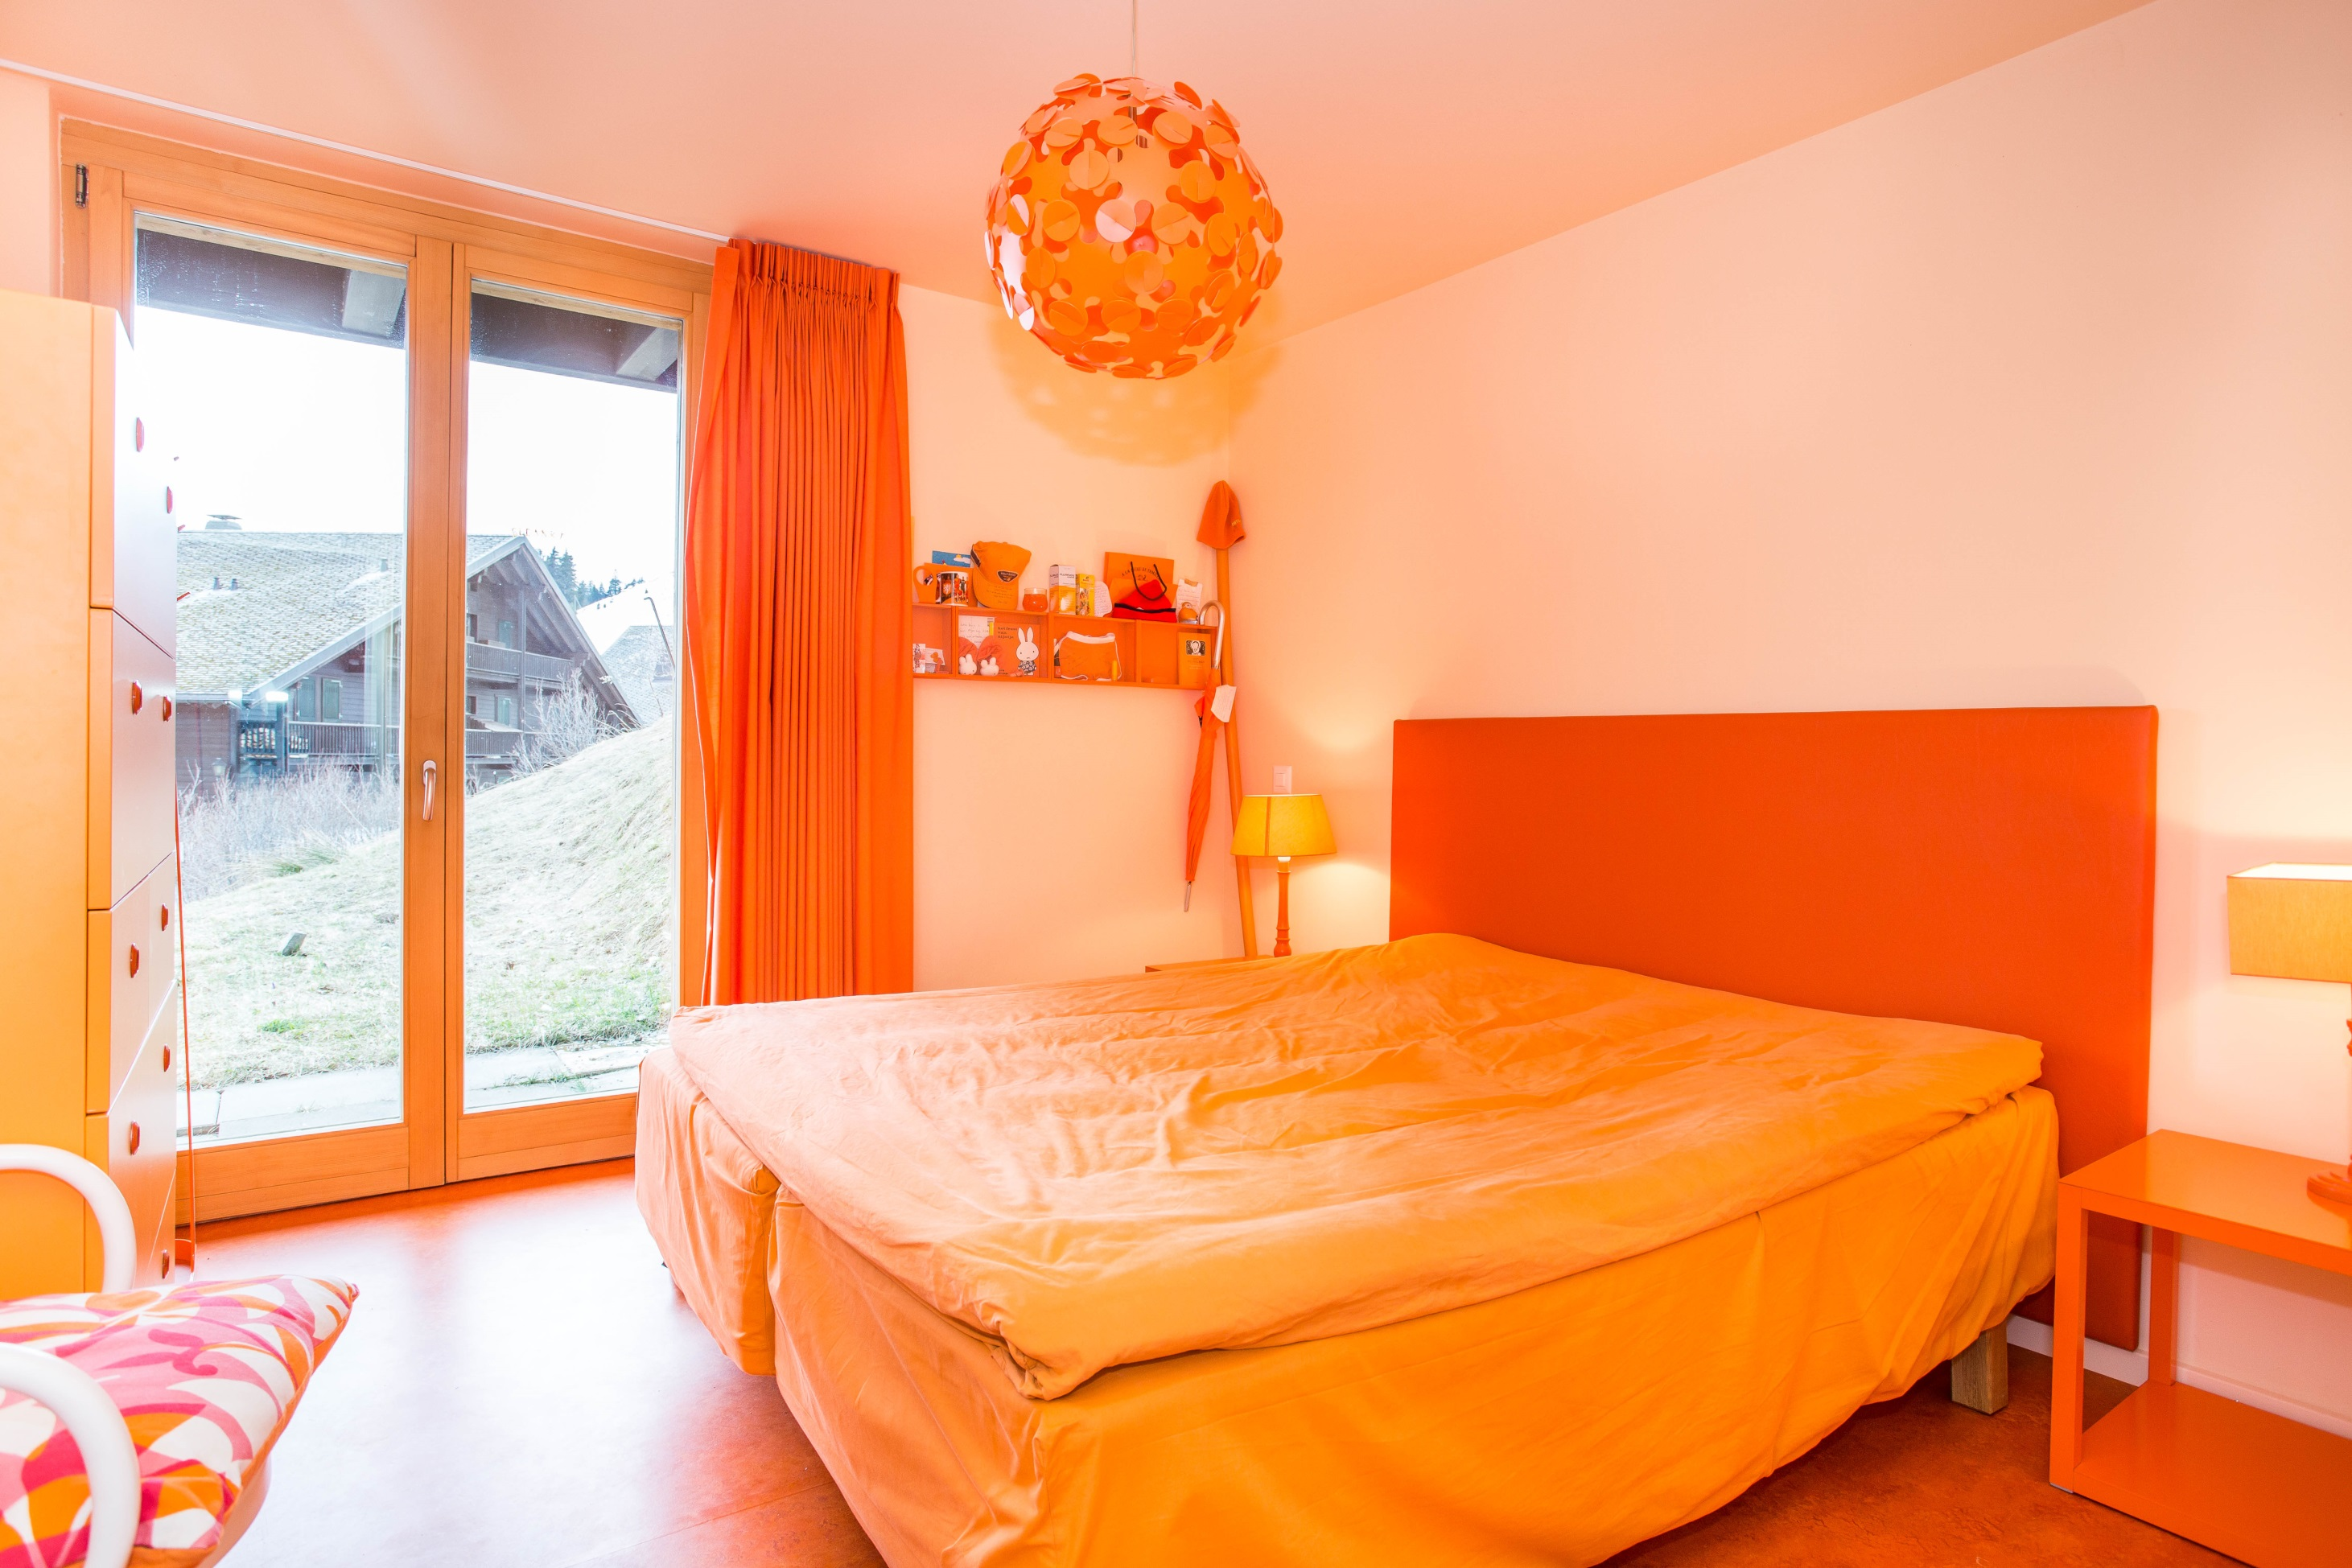 Chambre Orange 1 Gf Immobiliergf Immobilier